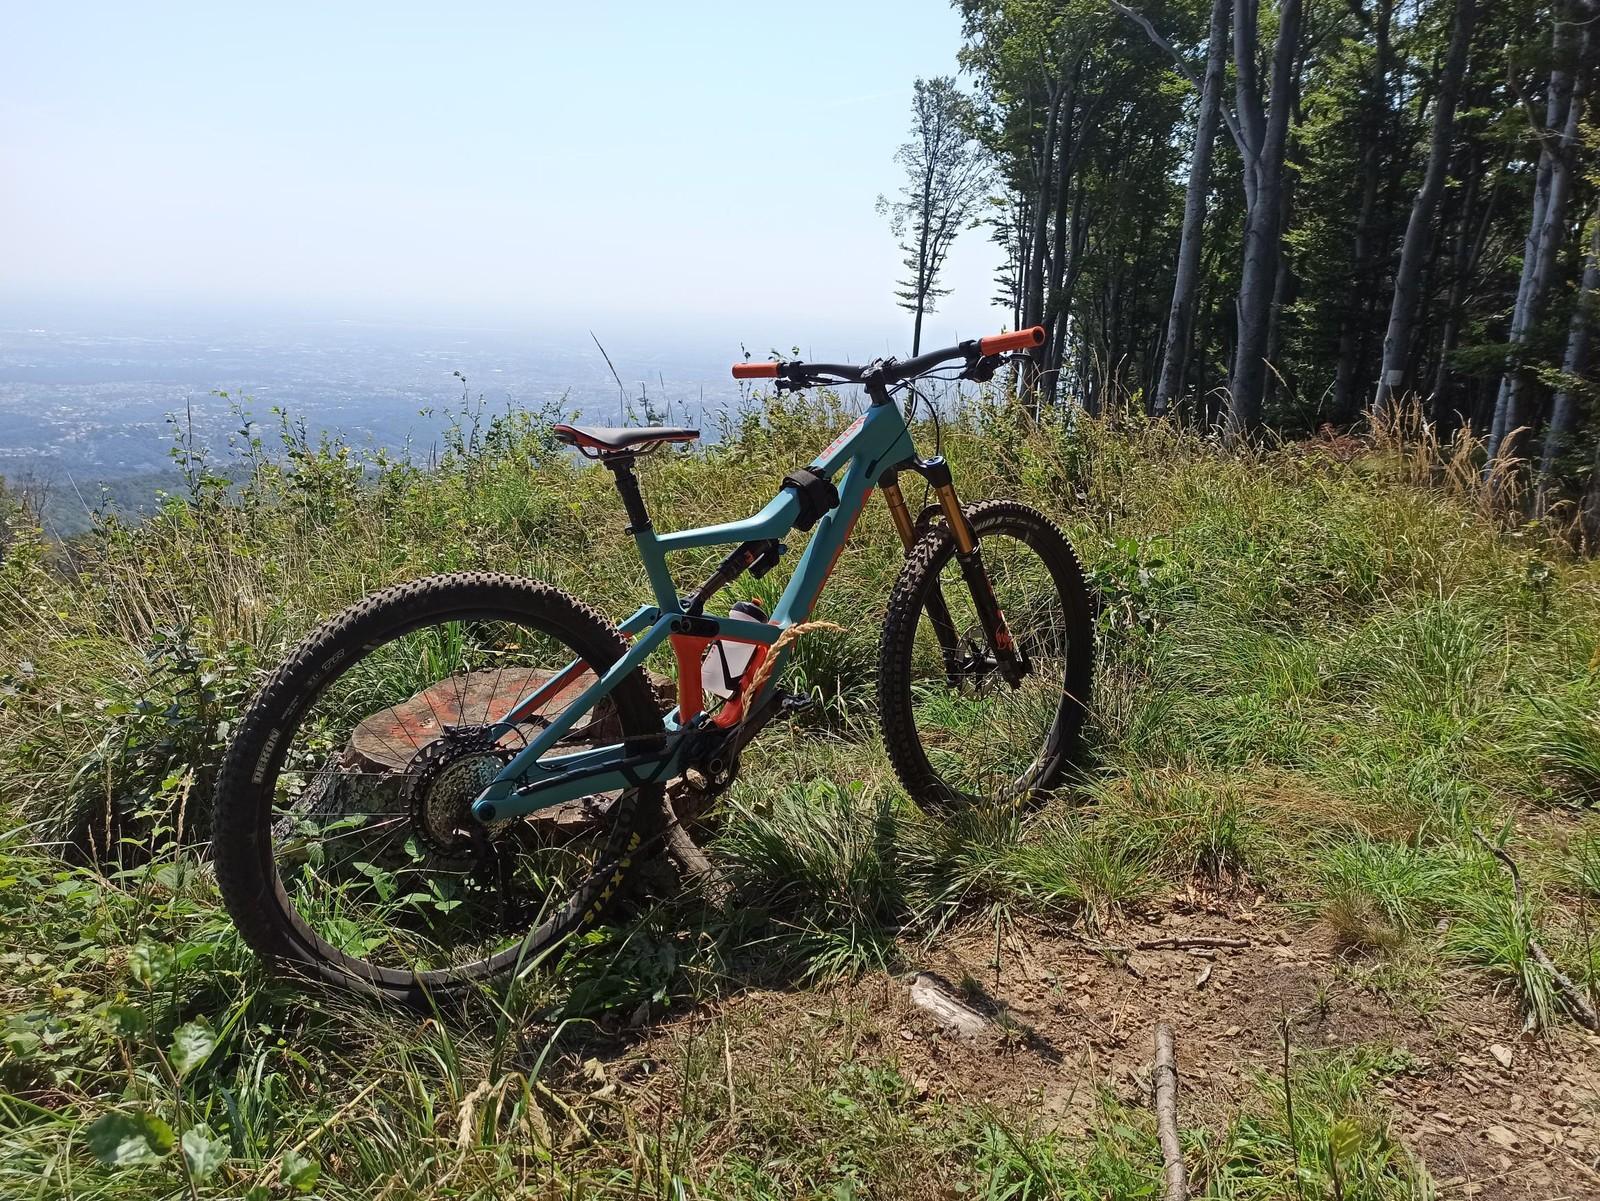 Superb trail bike